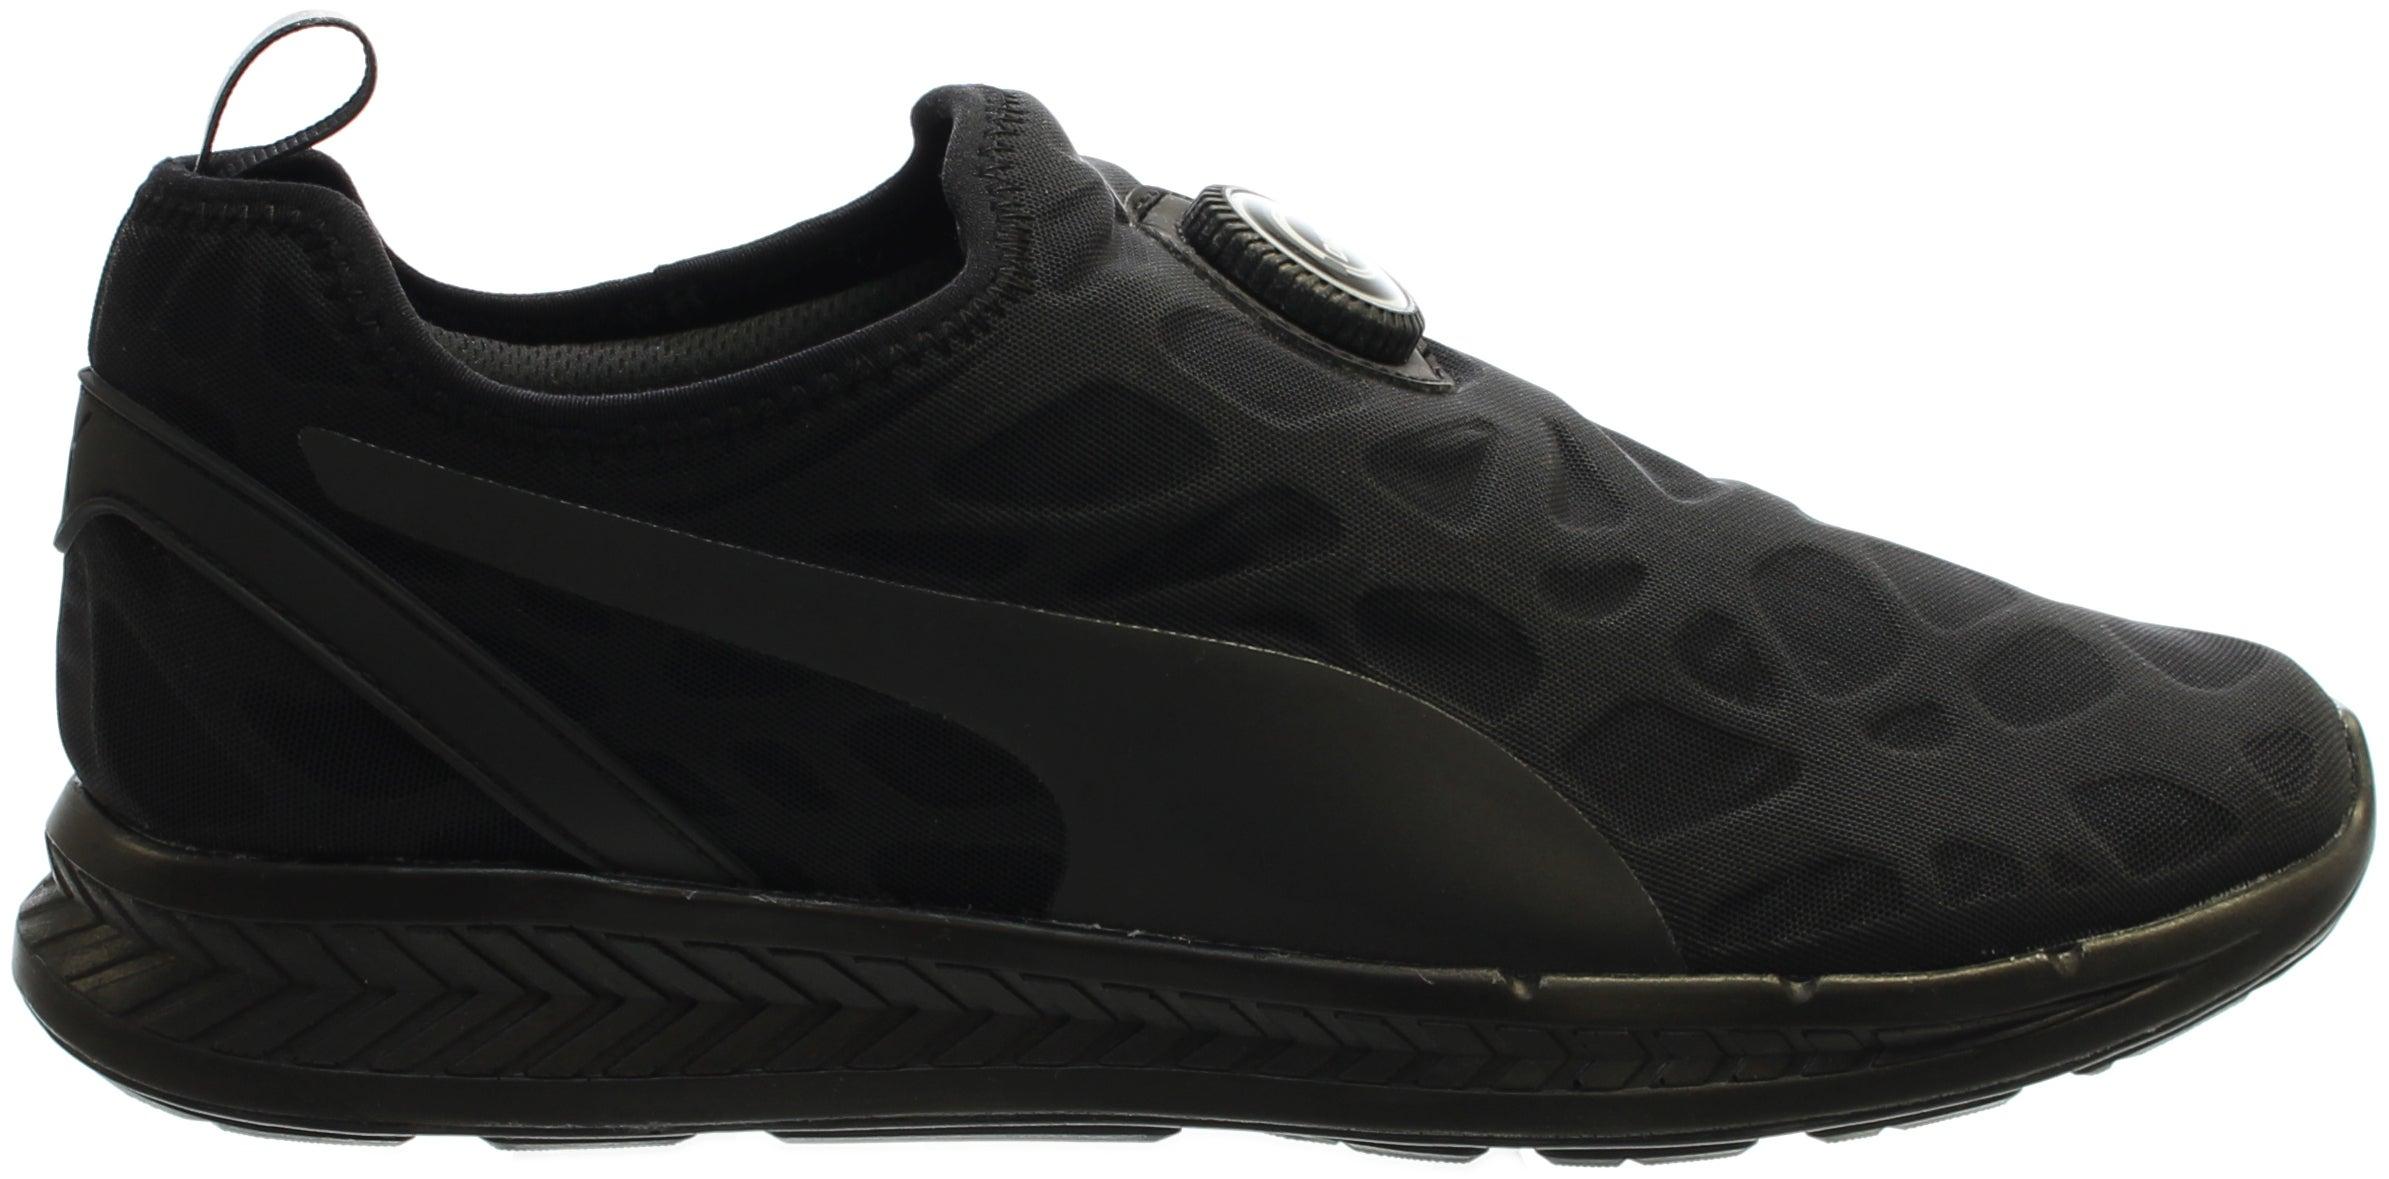 Puma Disc Sleeve Ignite Foam Black - Mens  - Size 10.5